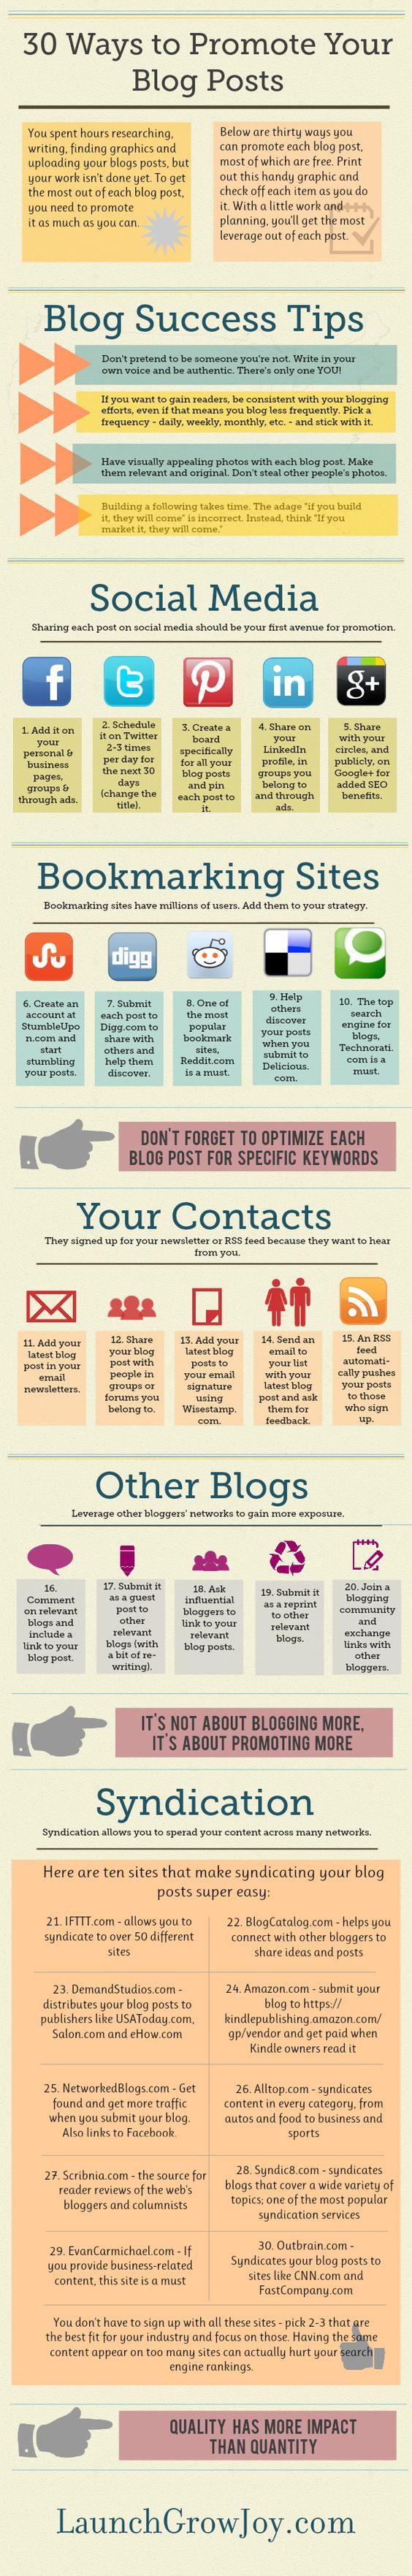 30 consejos para promocionar su blog - #infografia / 30 ways to promote your blog post - #infographic